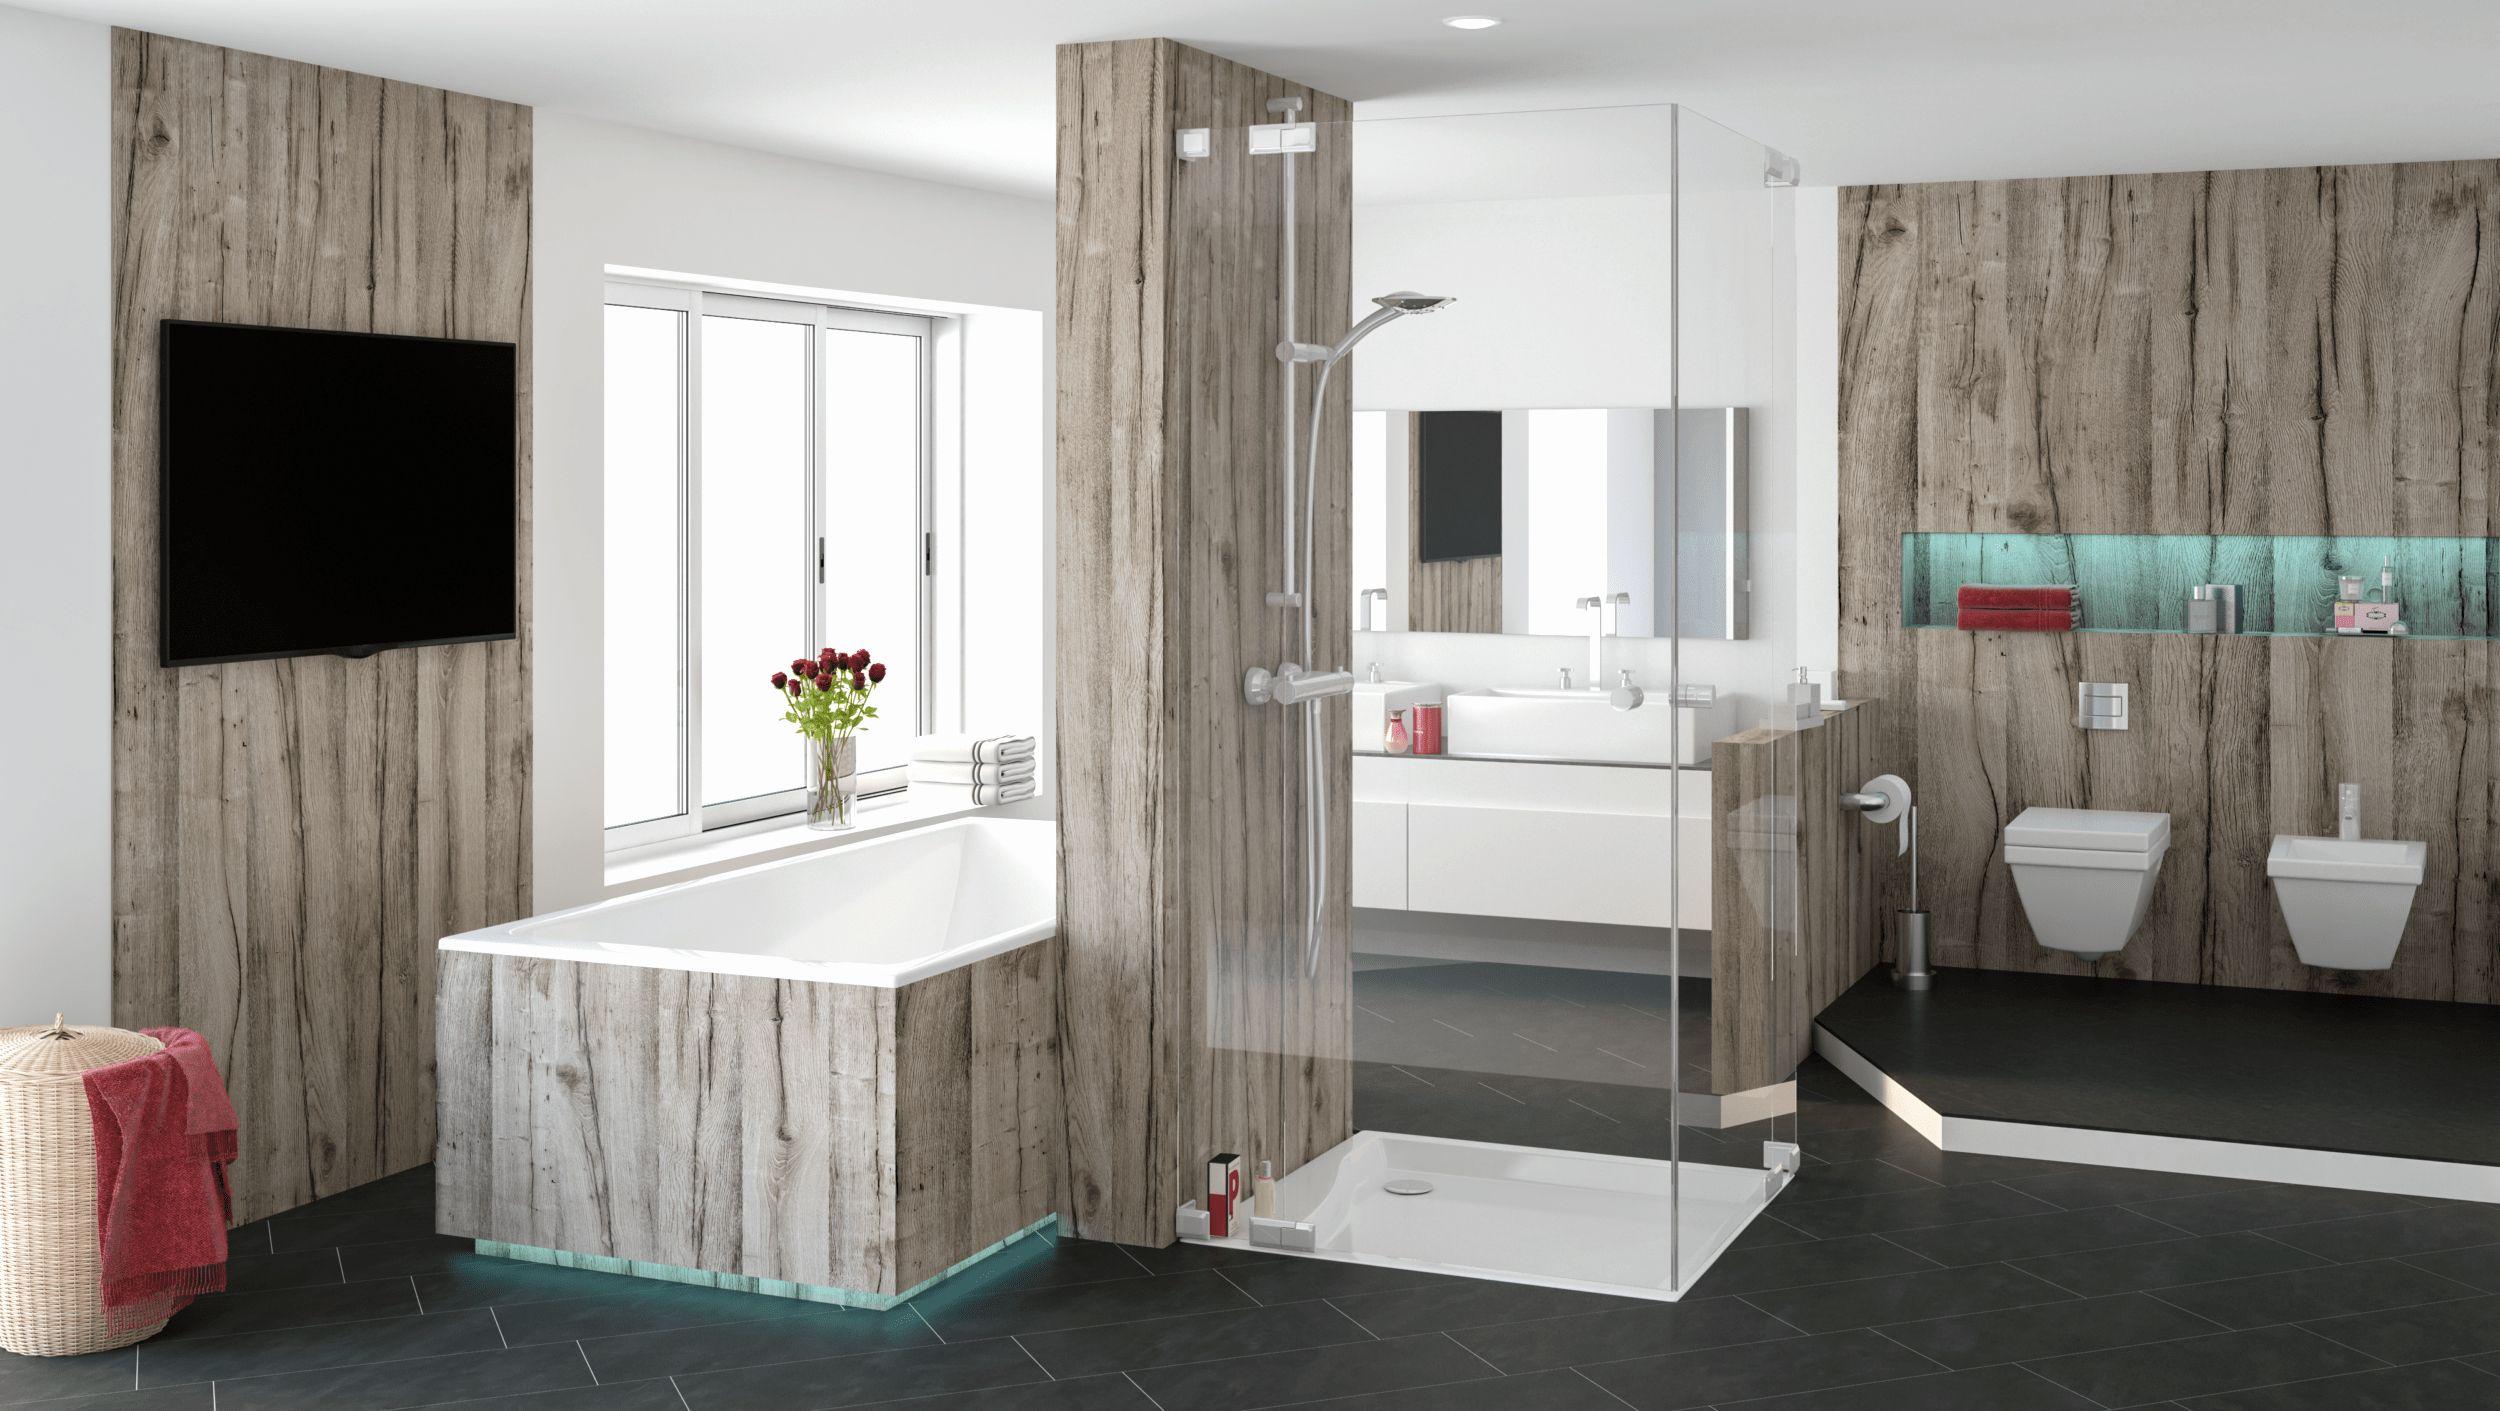 45 Voller Inspiration Badezimmer Kosmetik Aufbewahrung Fur Beauty House Bathroom Bathtub